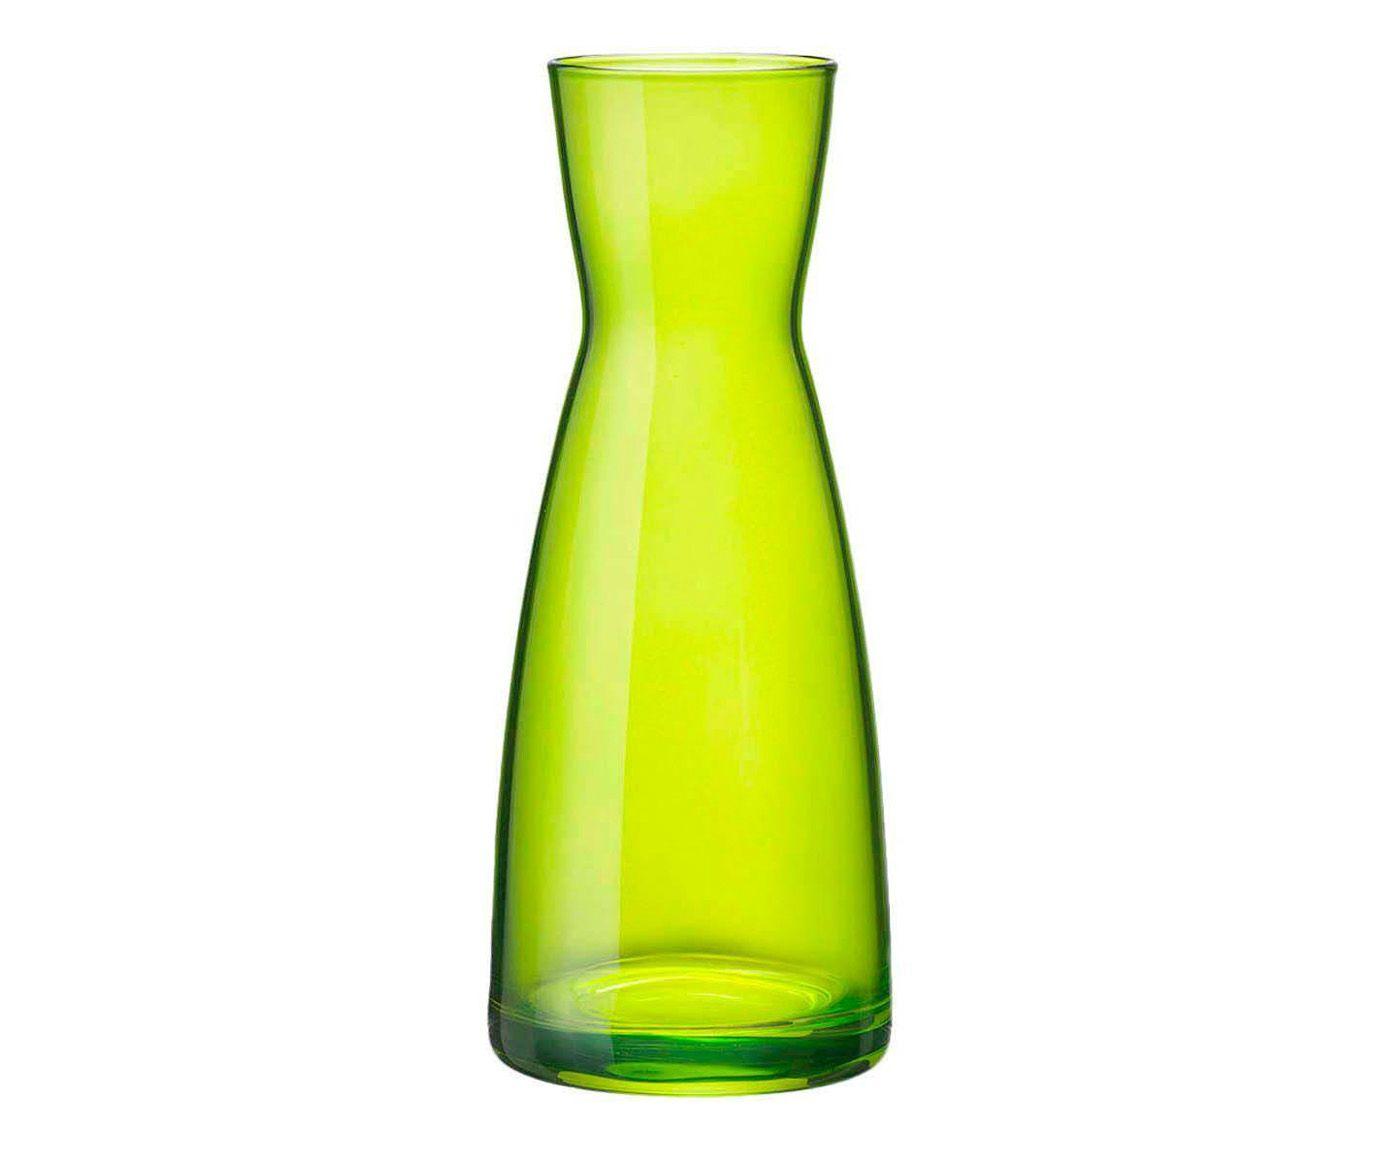 Jarra Ypsilon Verde - 500ml   Westwing.com.br